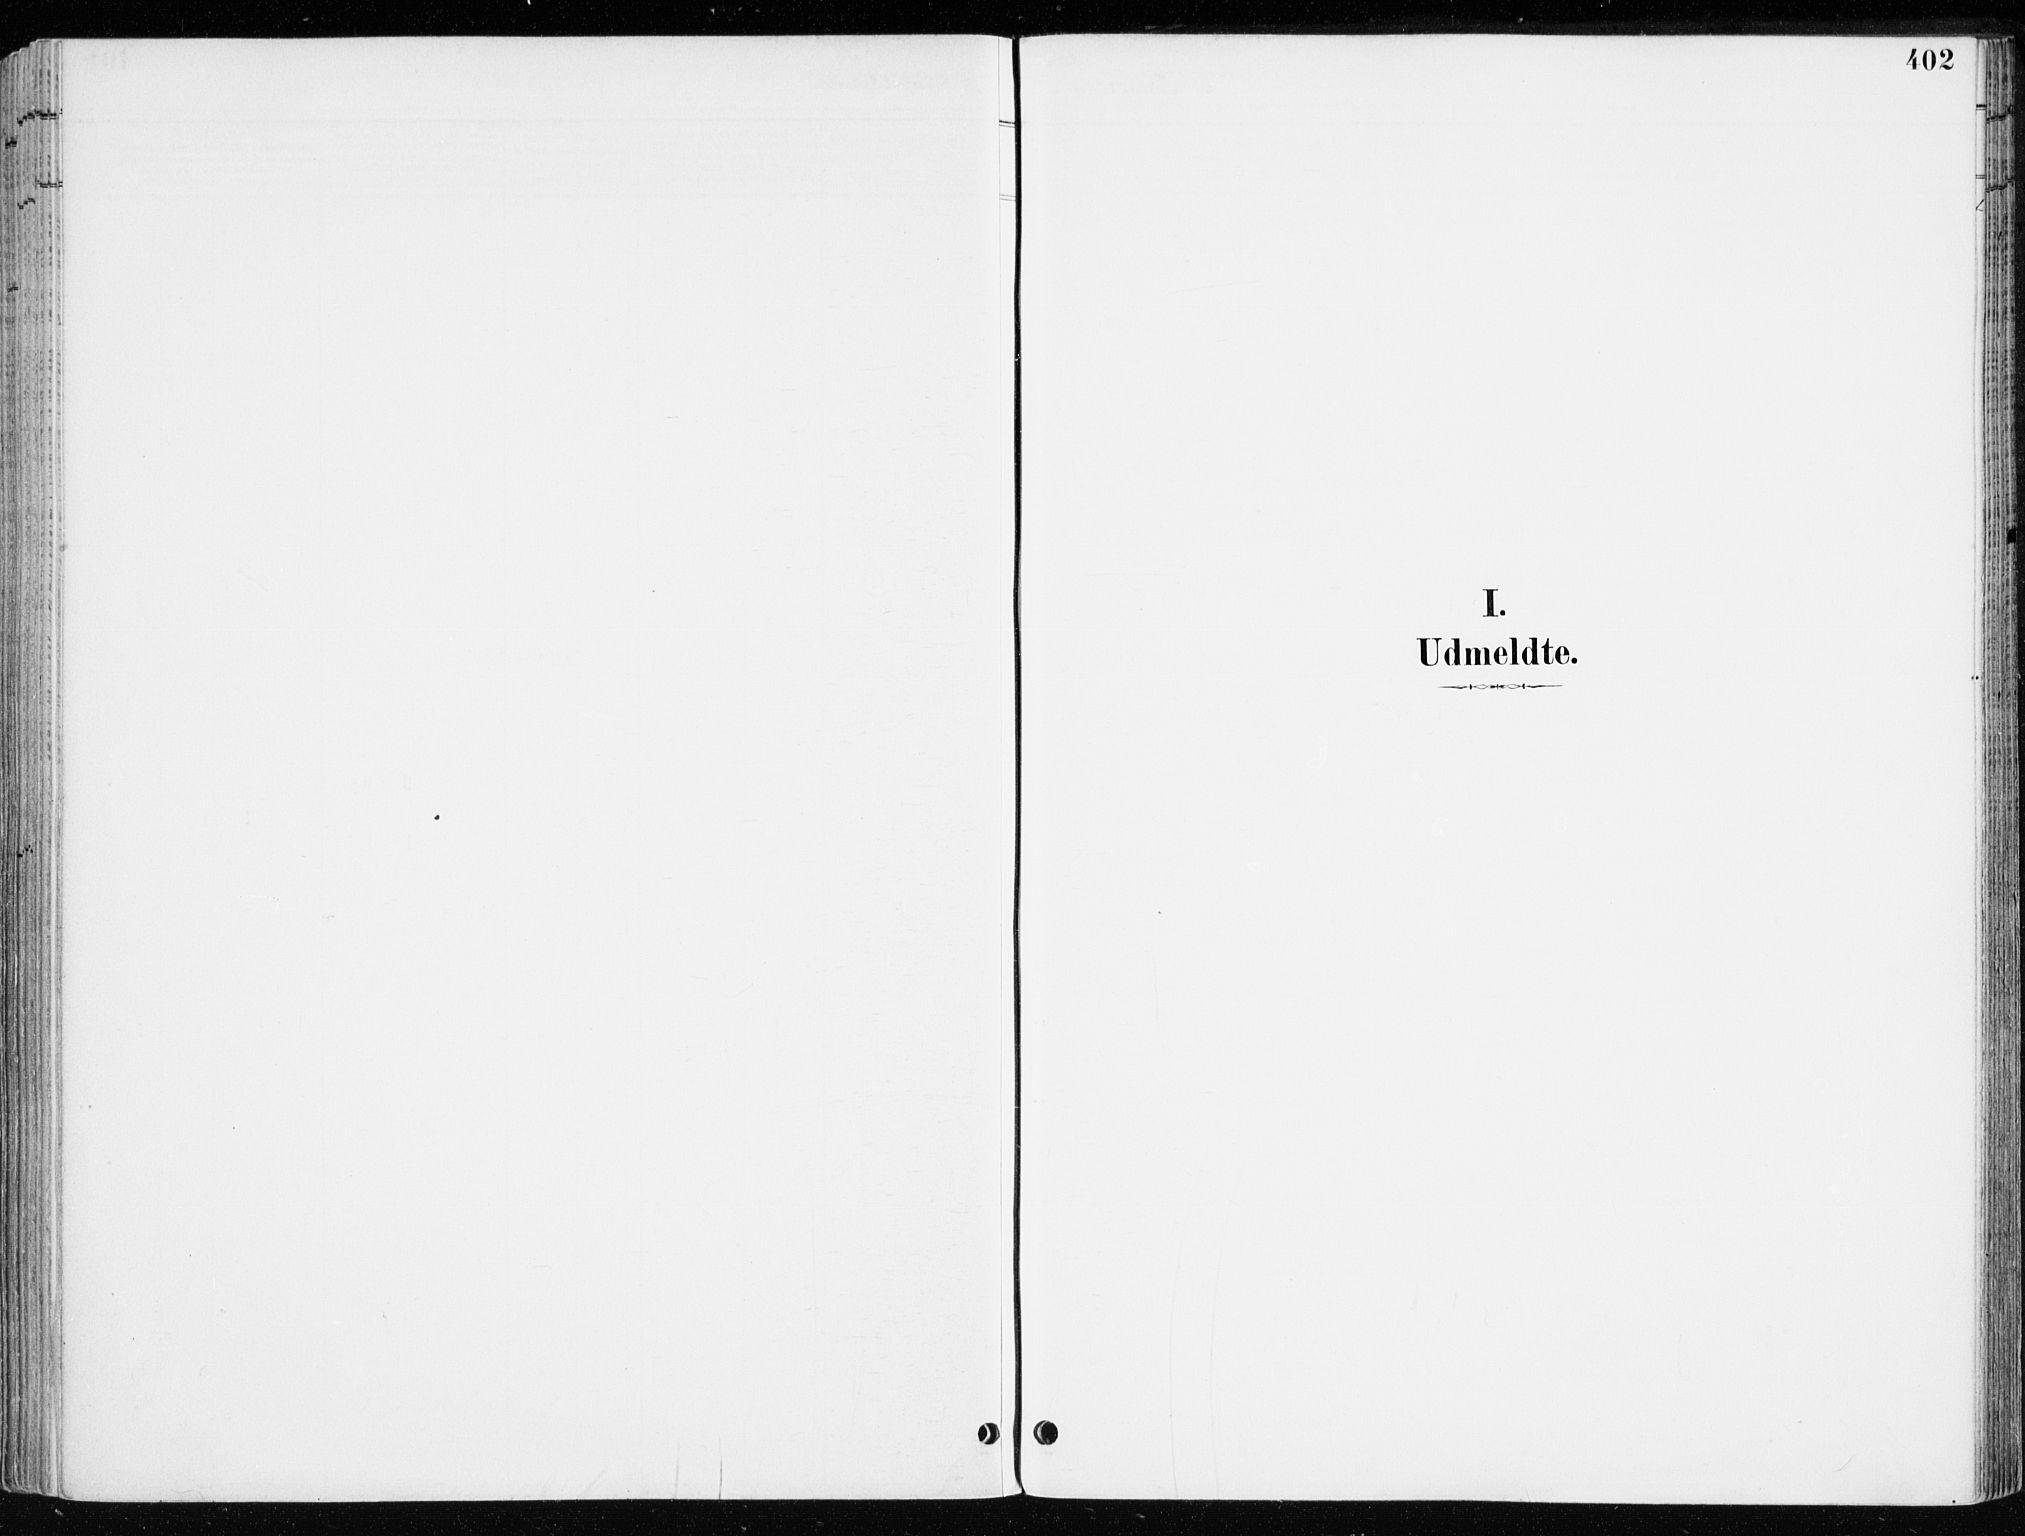 SAH, Løten prestekontor, K/Ka/L0010: Ministerialbok nr. 10, 1892-1907, s. 402